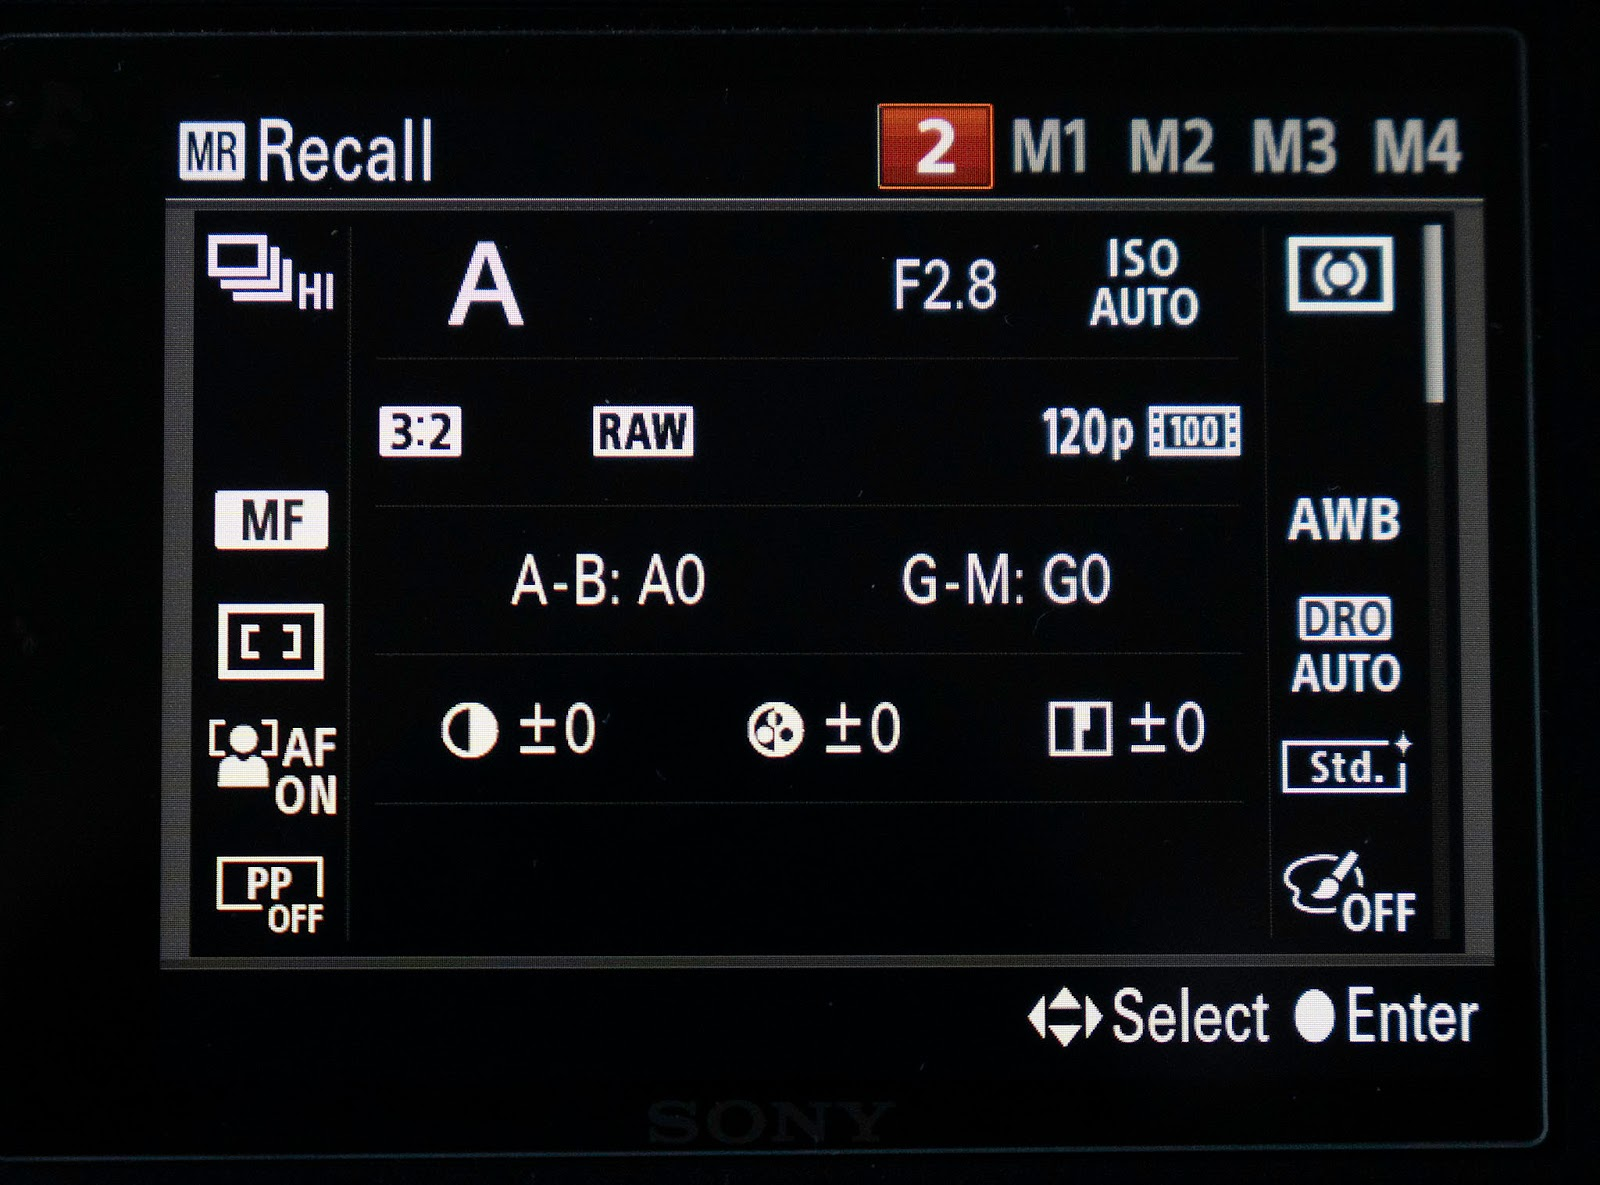 Sony A7iii Latest Firmware